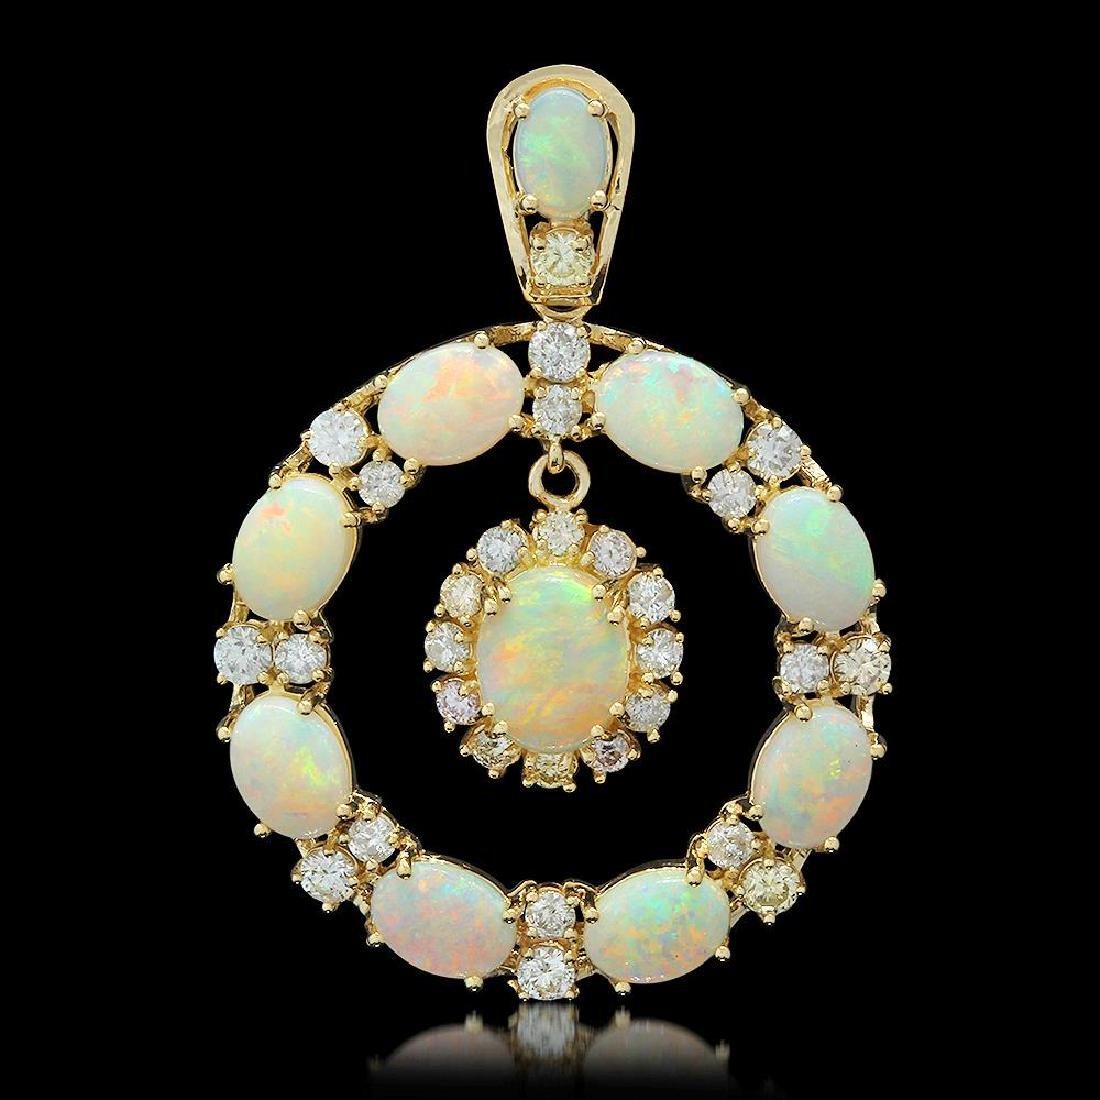 14K Gold 7.43ct Opal 2.42ct Diamond Pendant